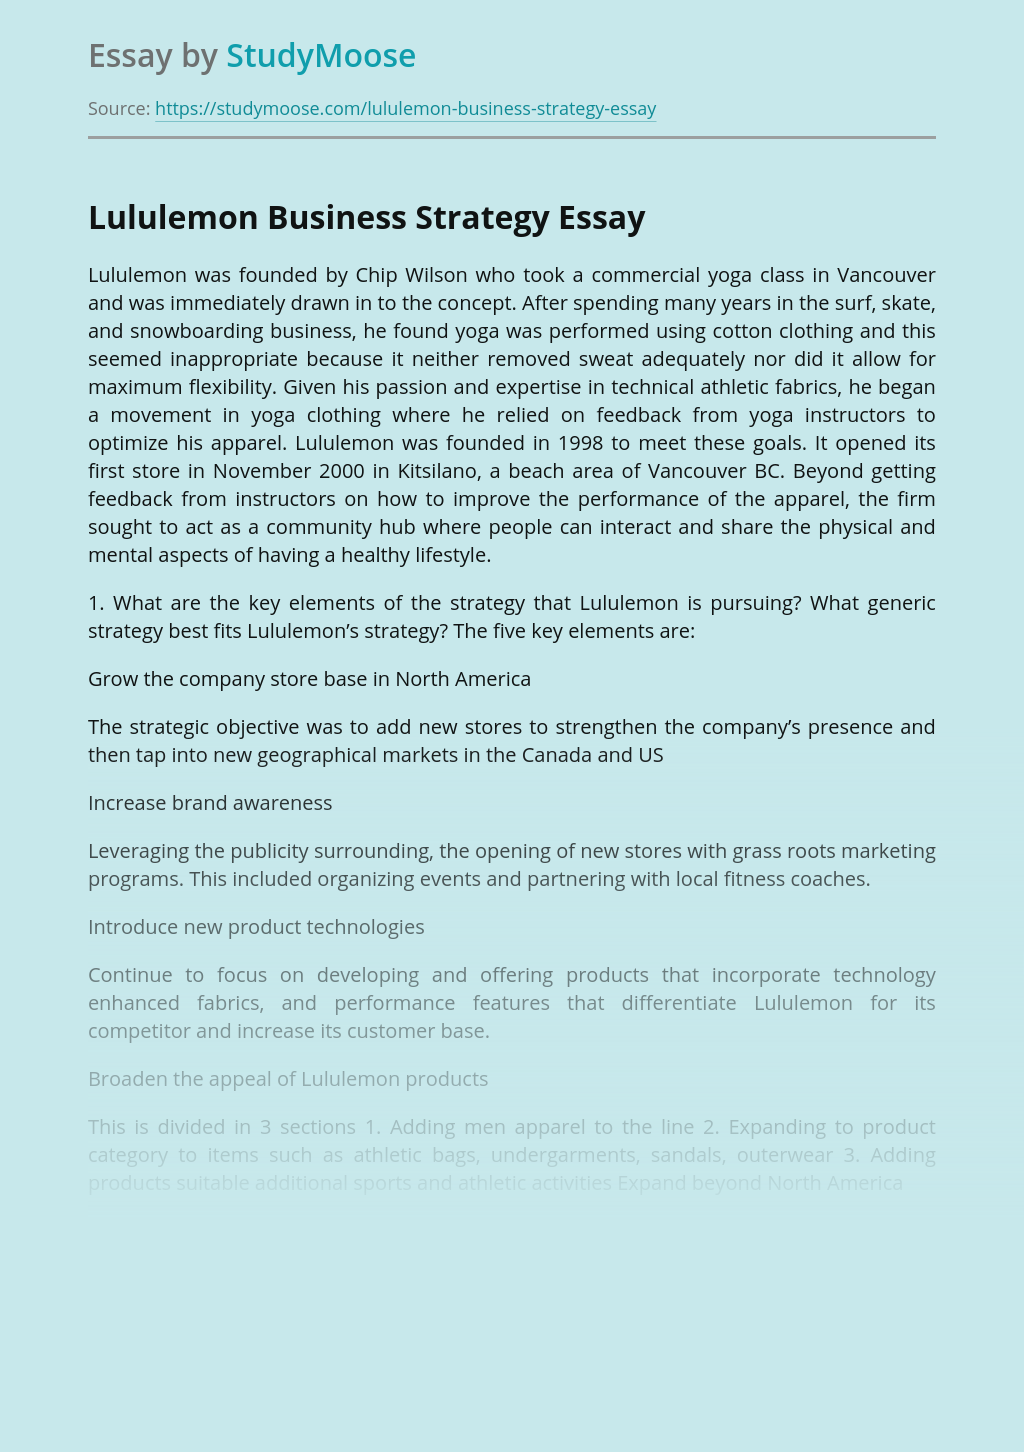 Lululemon Business Strategy